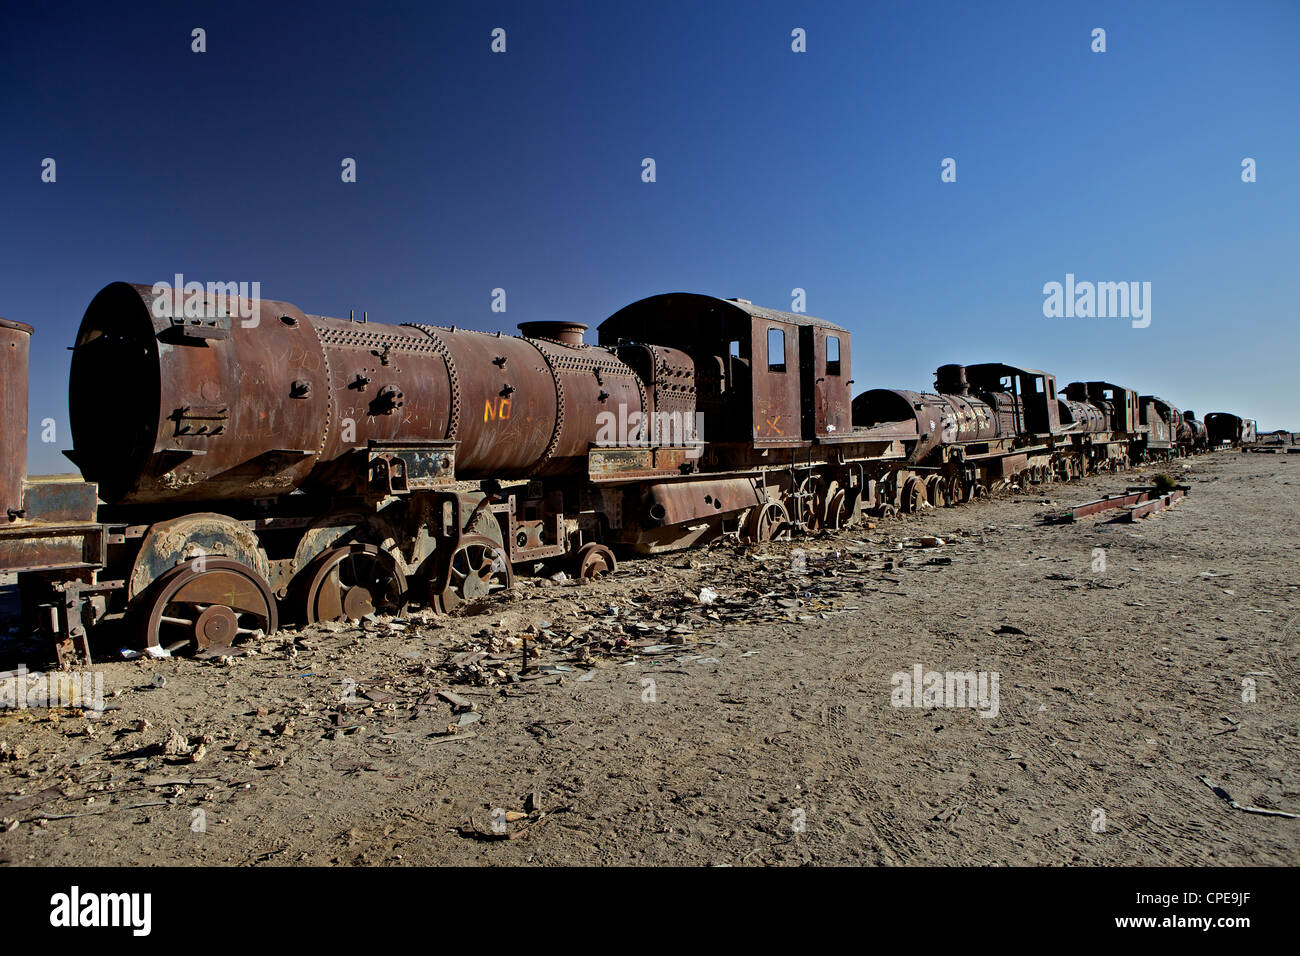 Rusting locomotive at train graveyard, Uyuni, Bolivia, South America - Stock Image